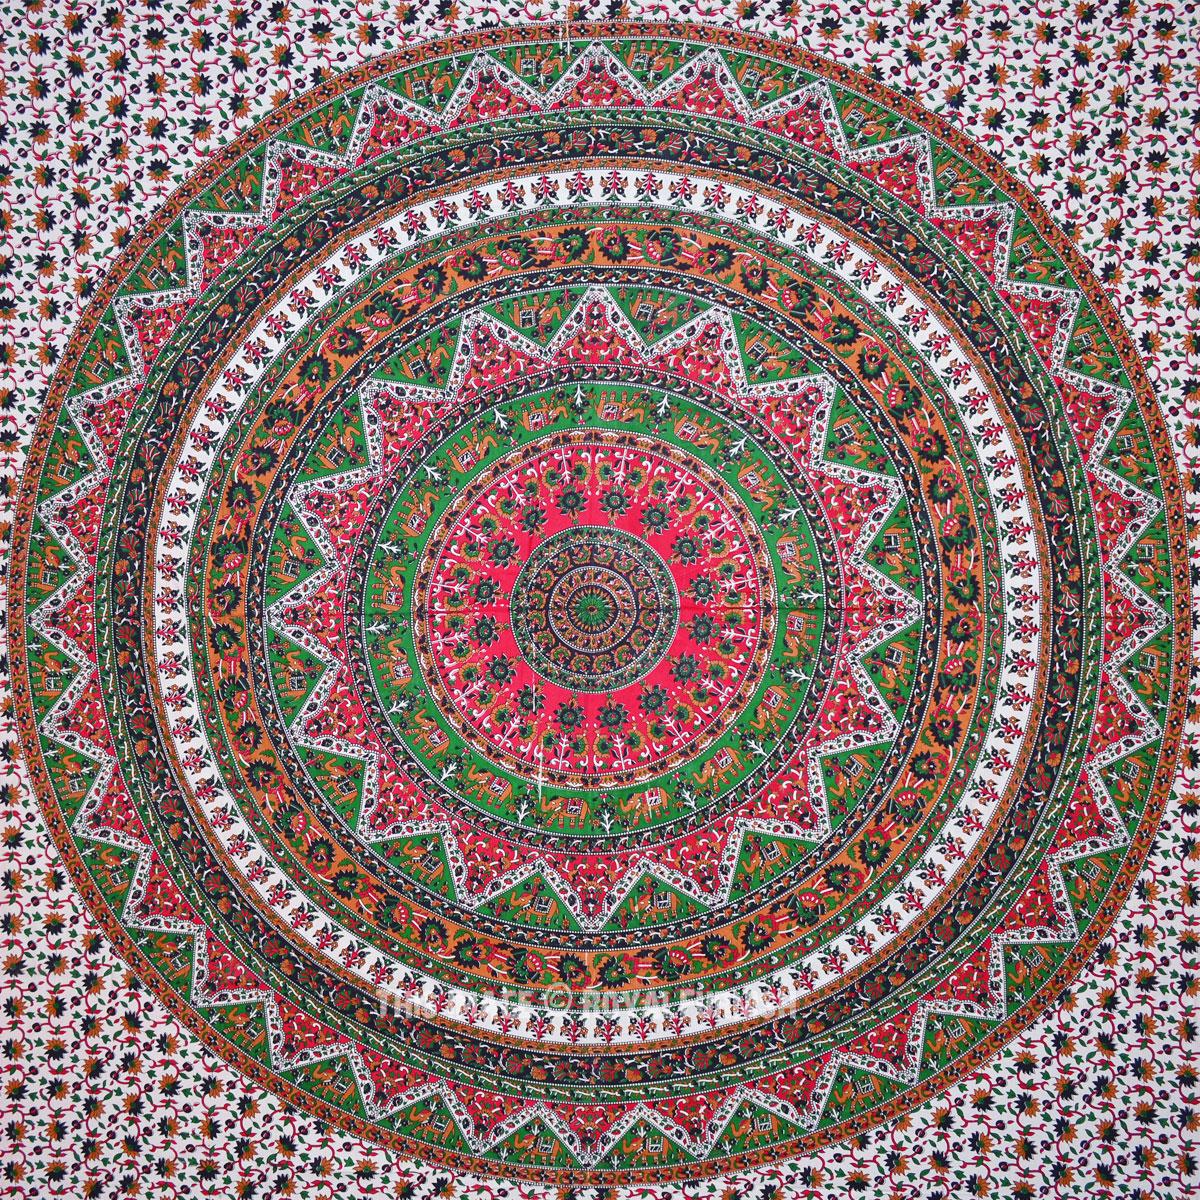 Mandala Tapestry Bedroom